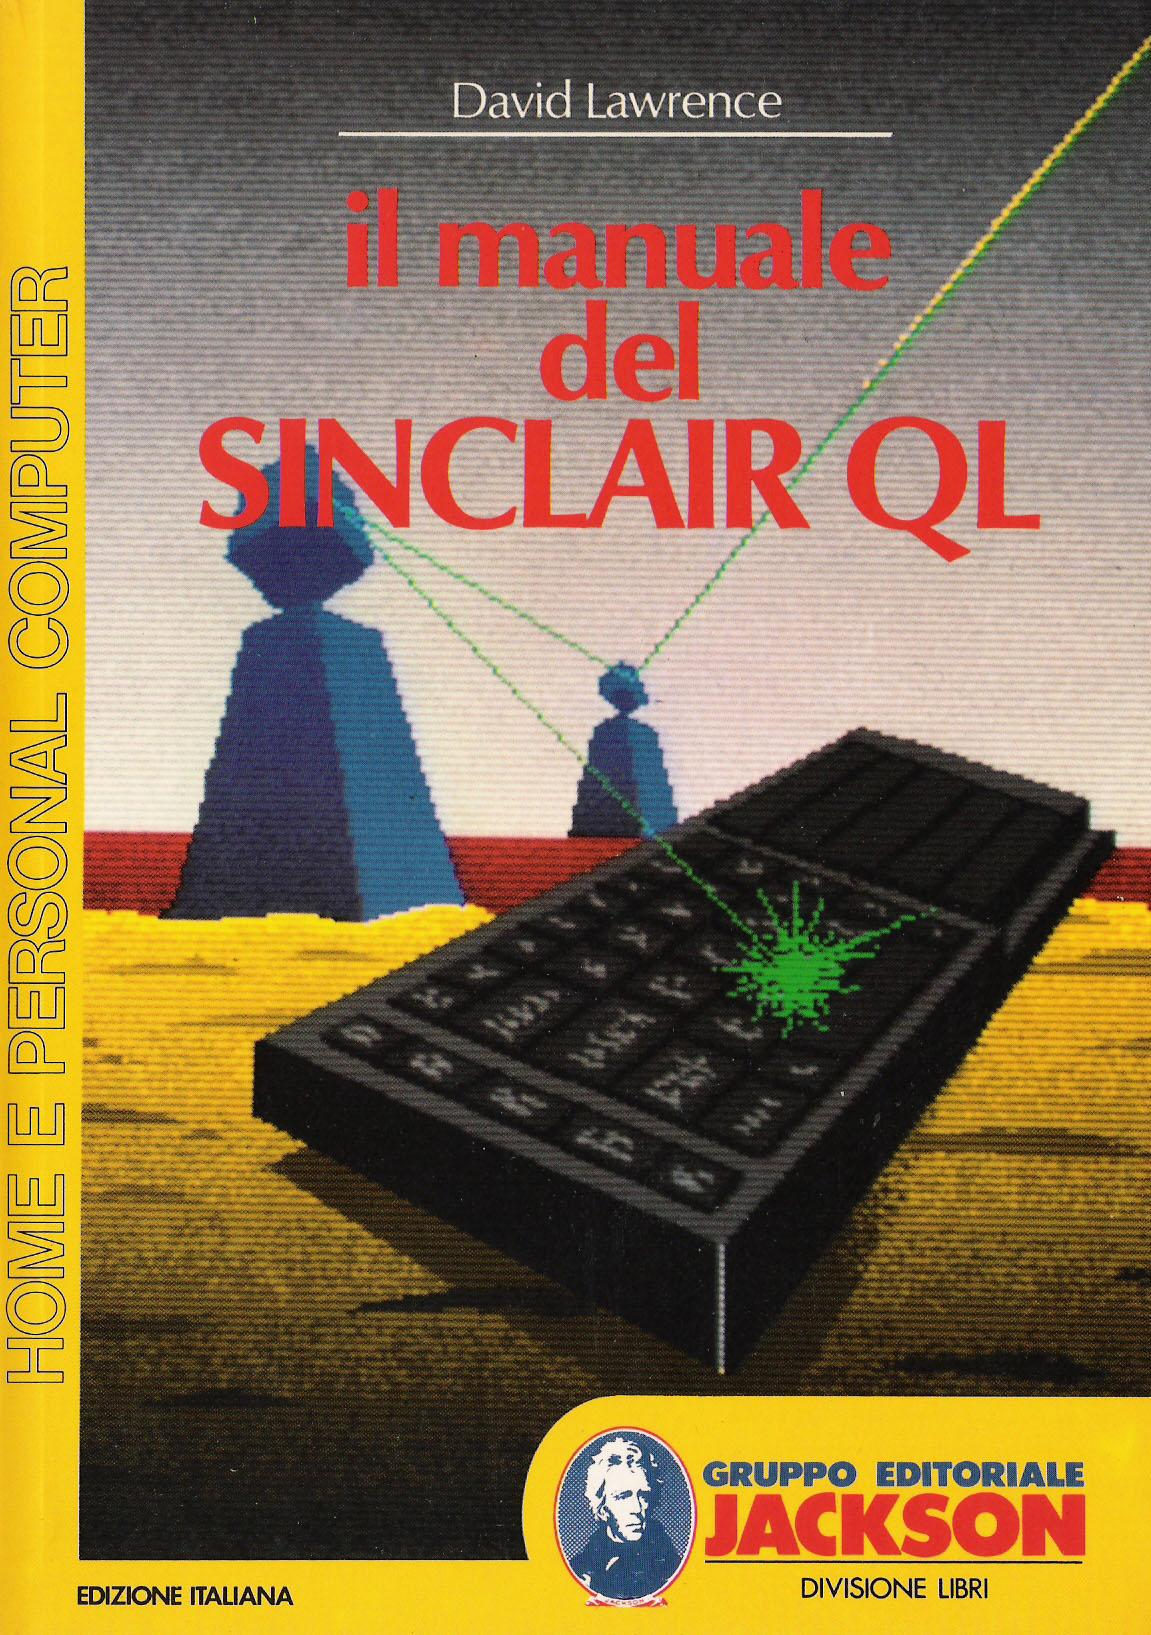 Il Manuale del Sinclair QL image, screenshot or loading screen